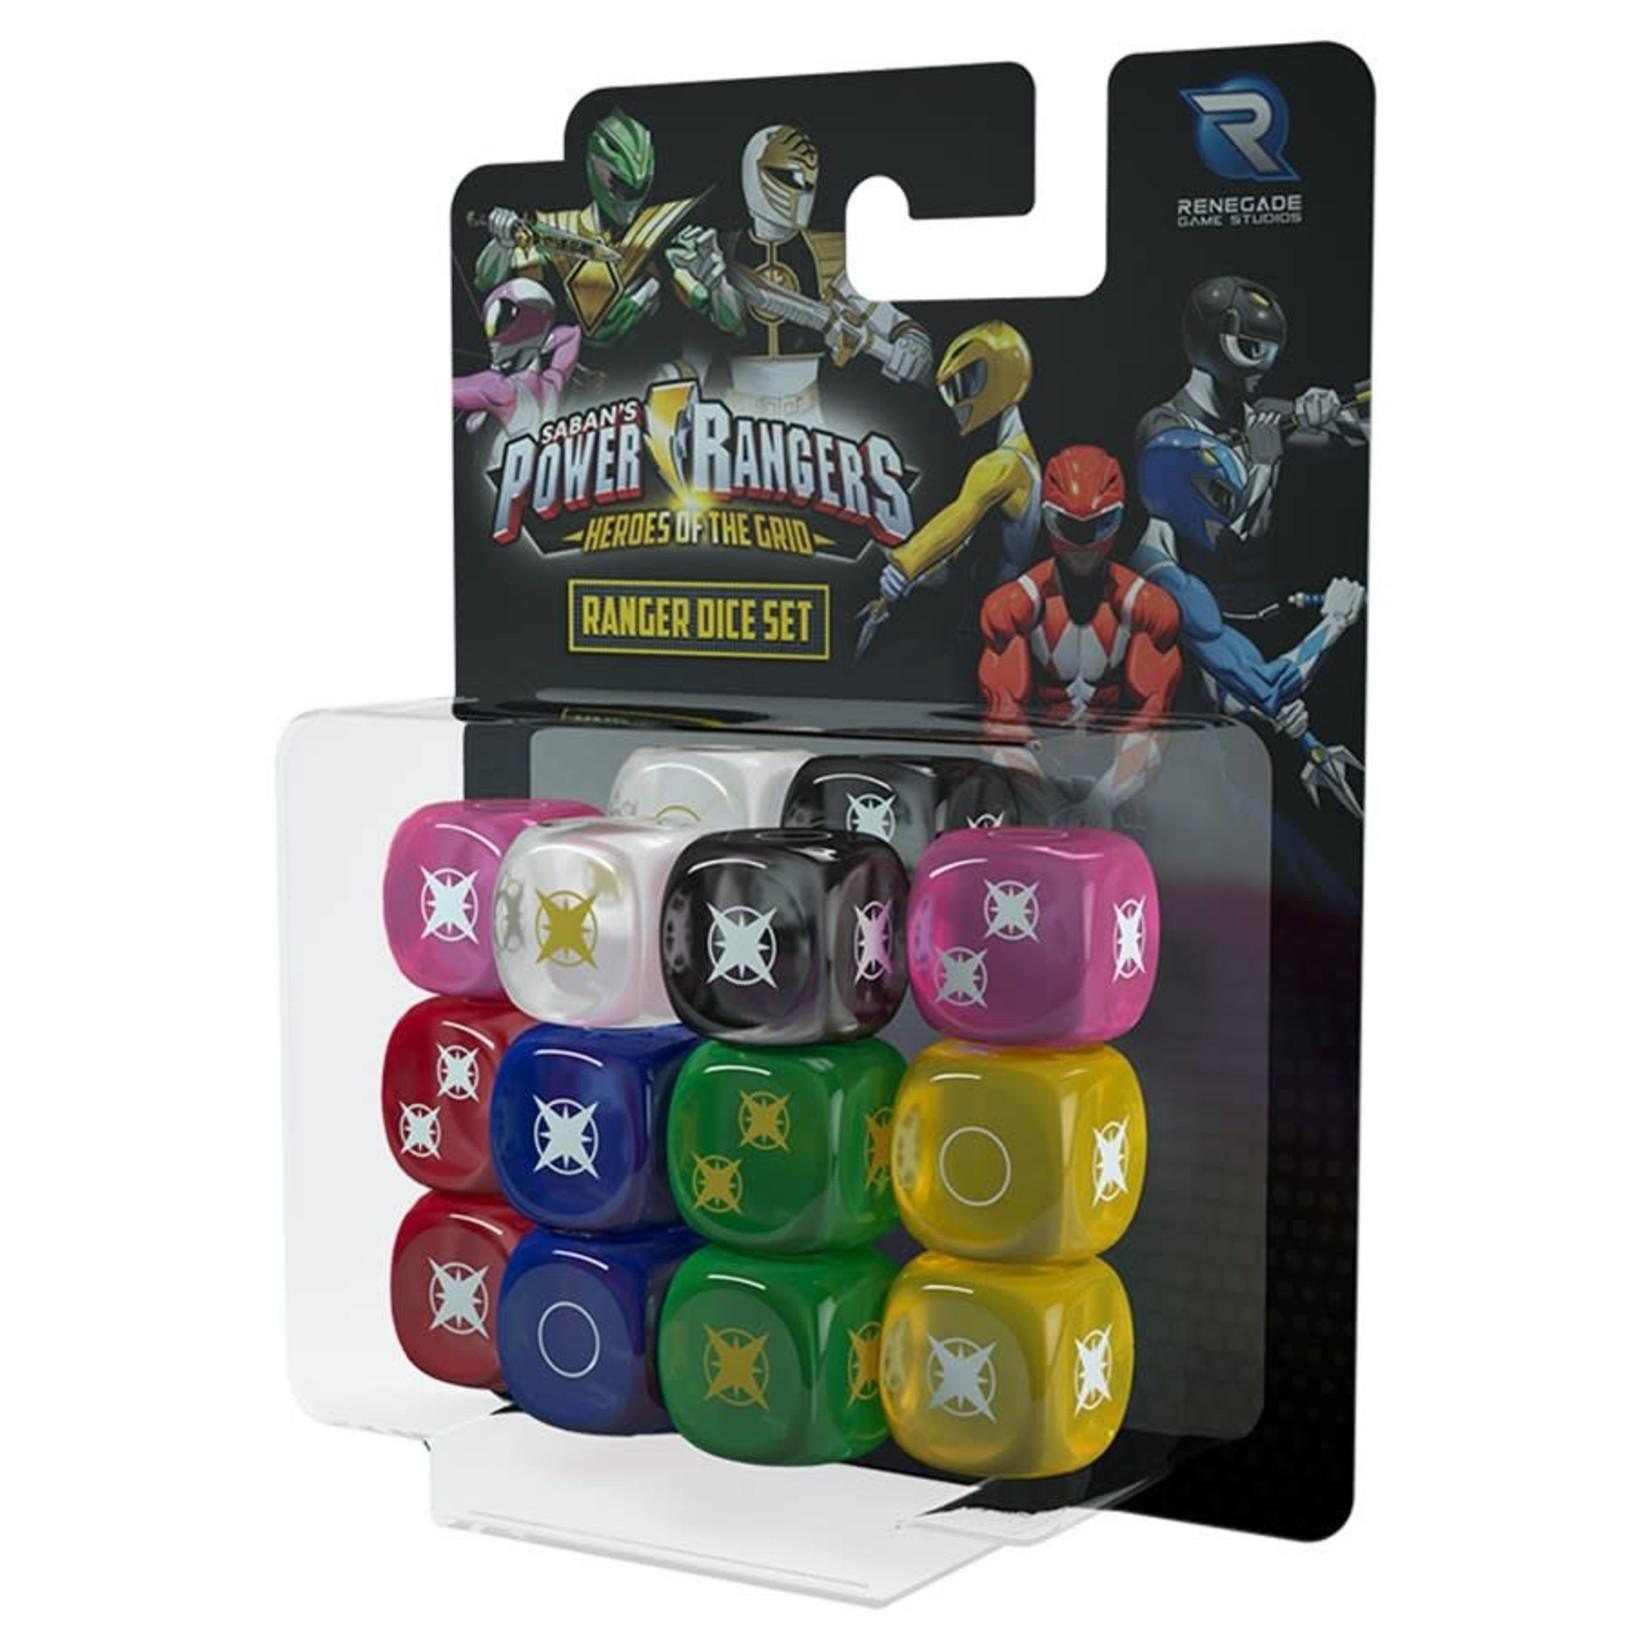 Renegade Power Rangers: Heroes of the Grid - Ranger Dice Set